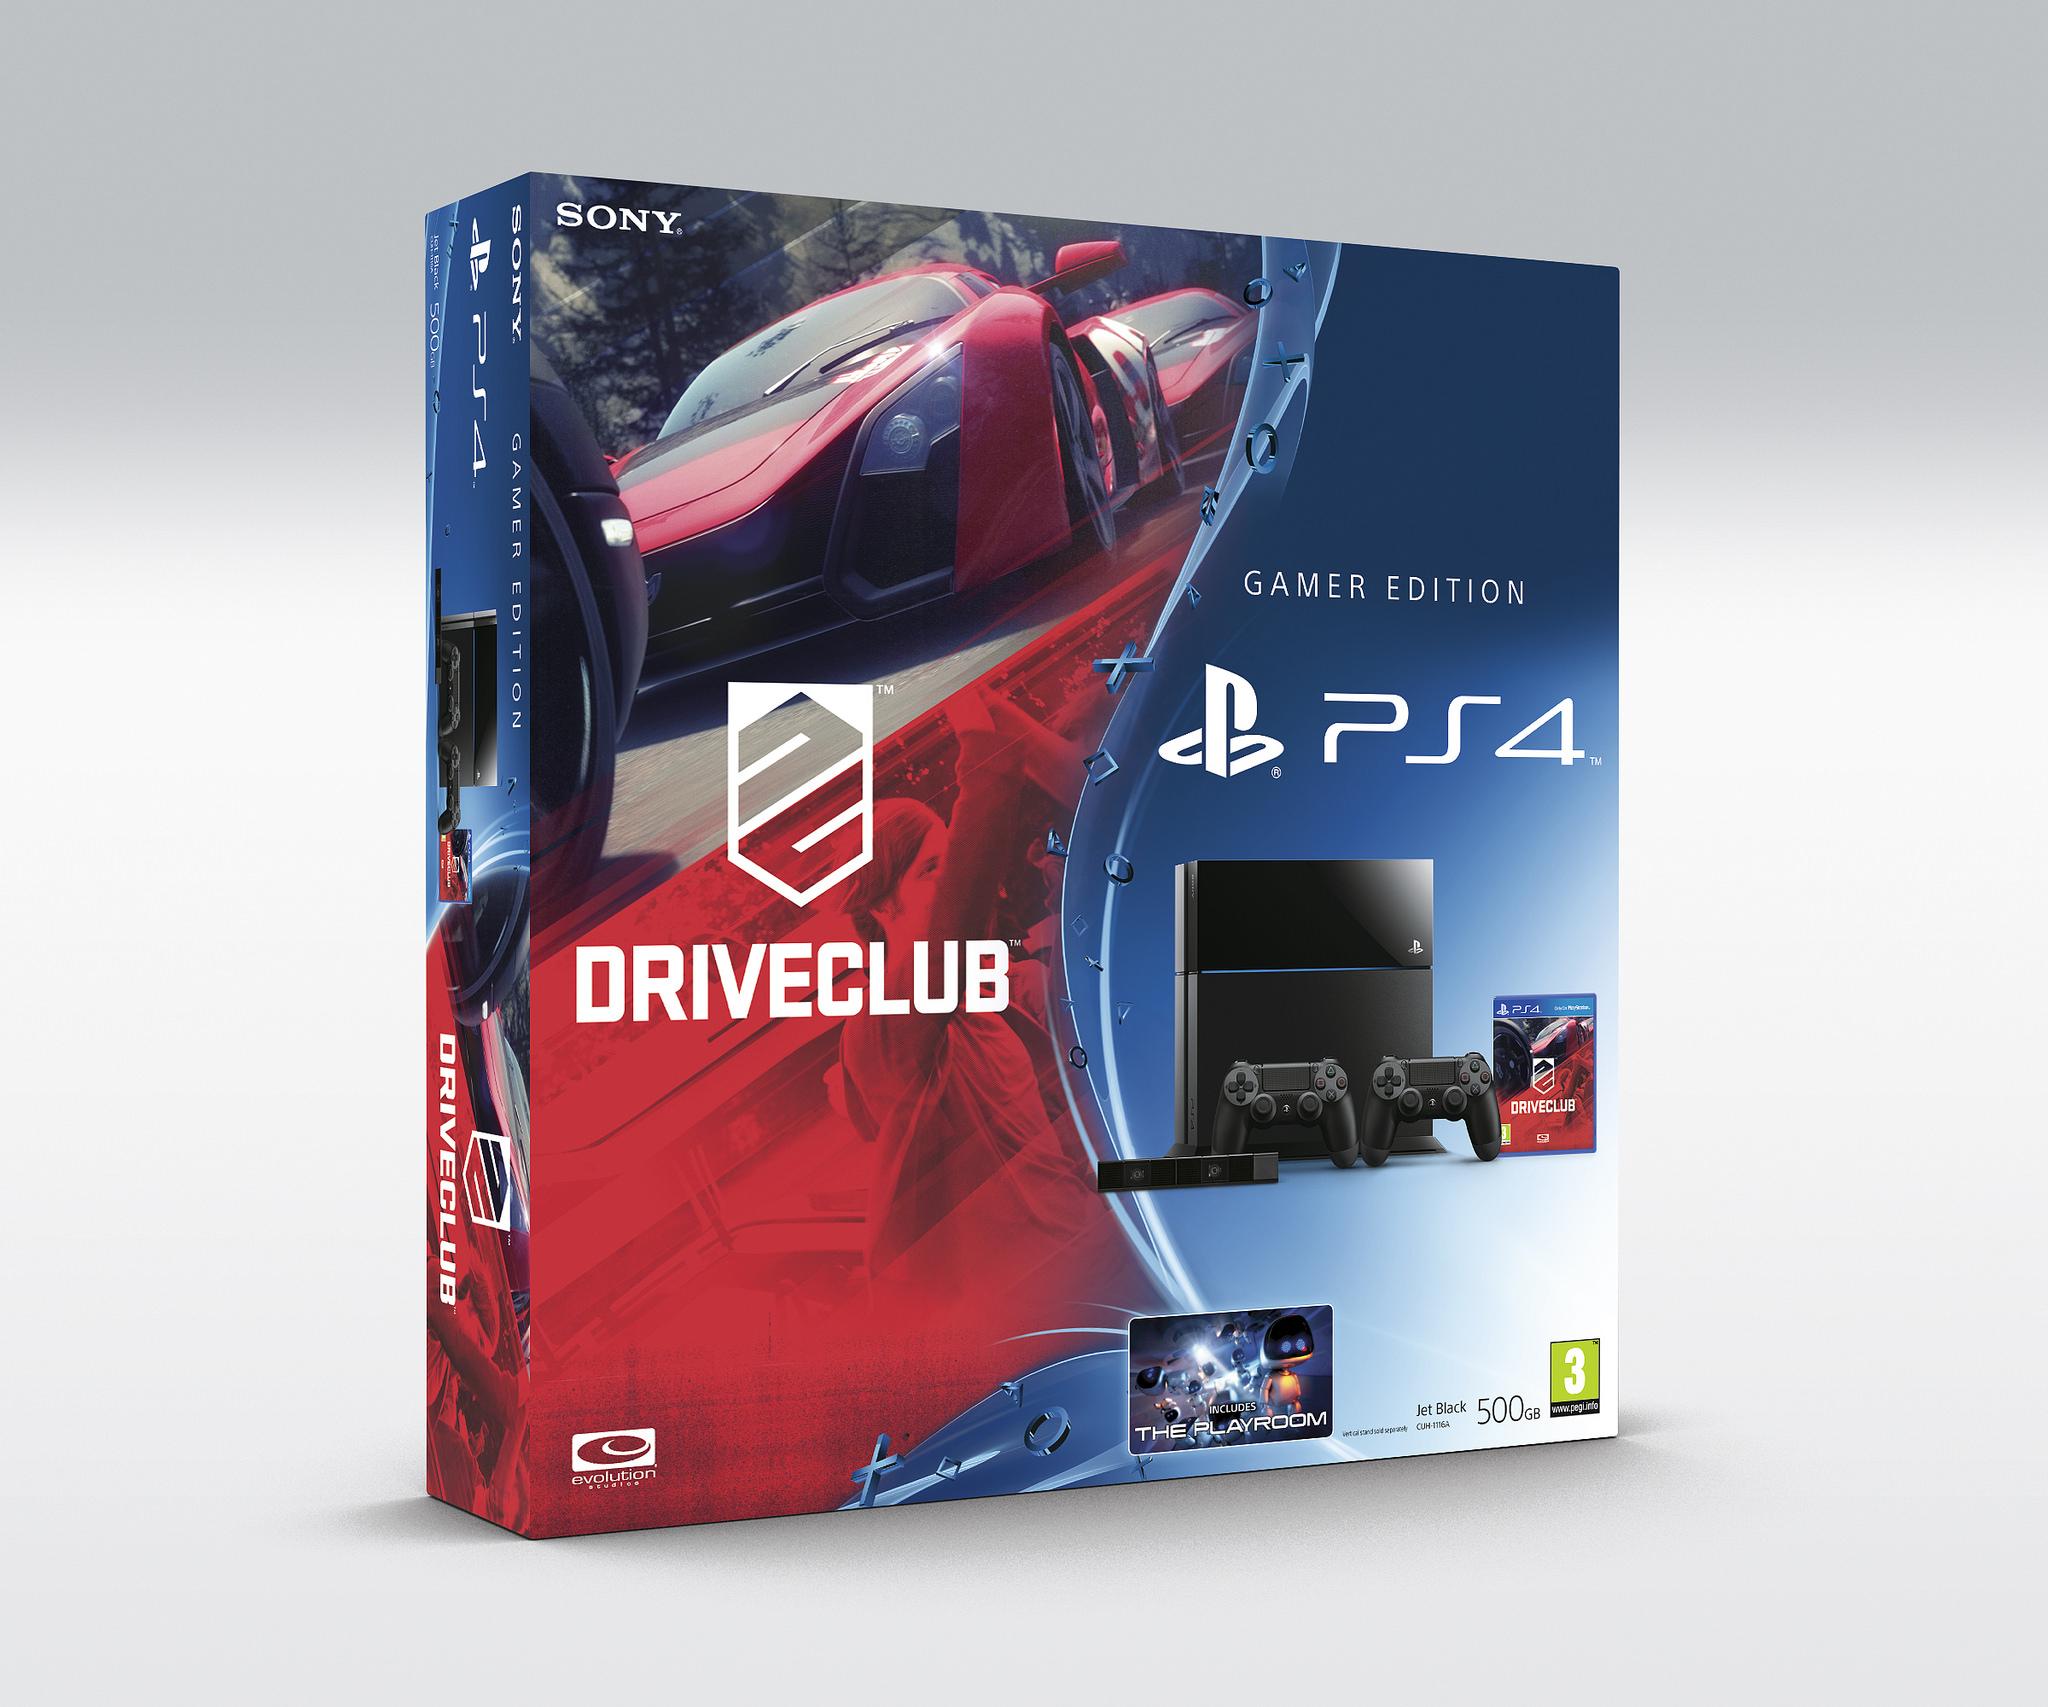 PlayStation 4 Gamer Edition Bundle